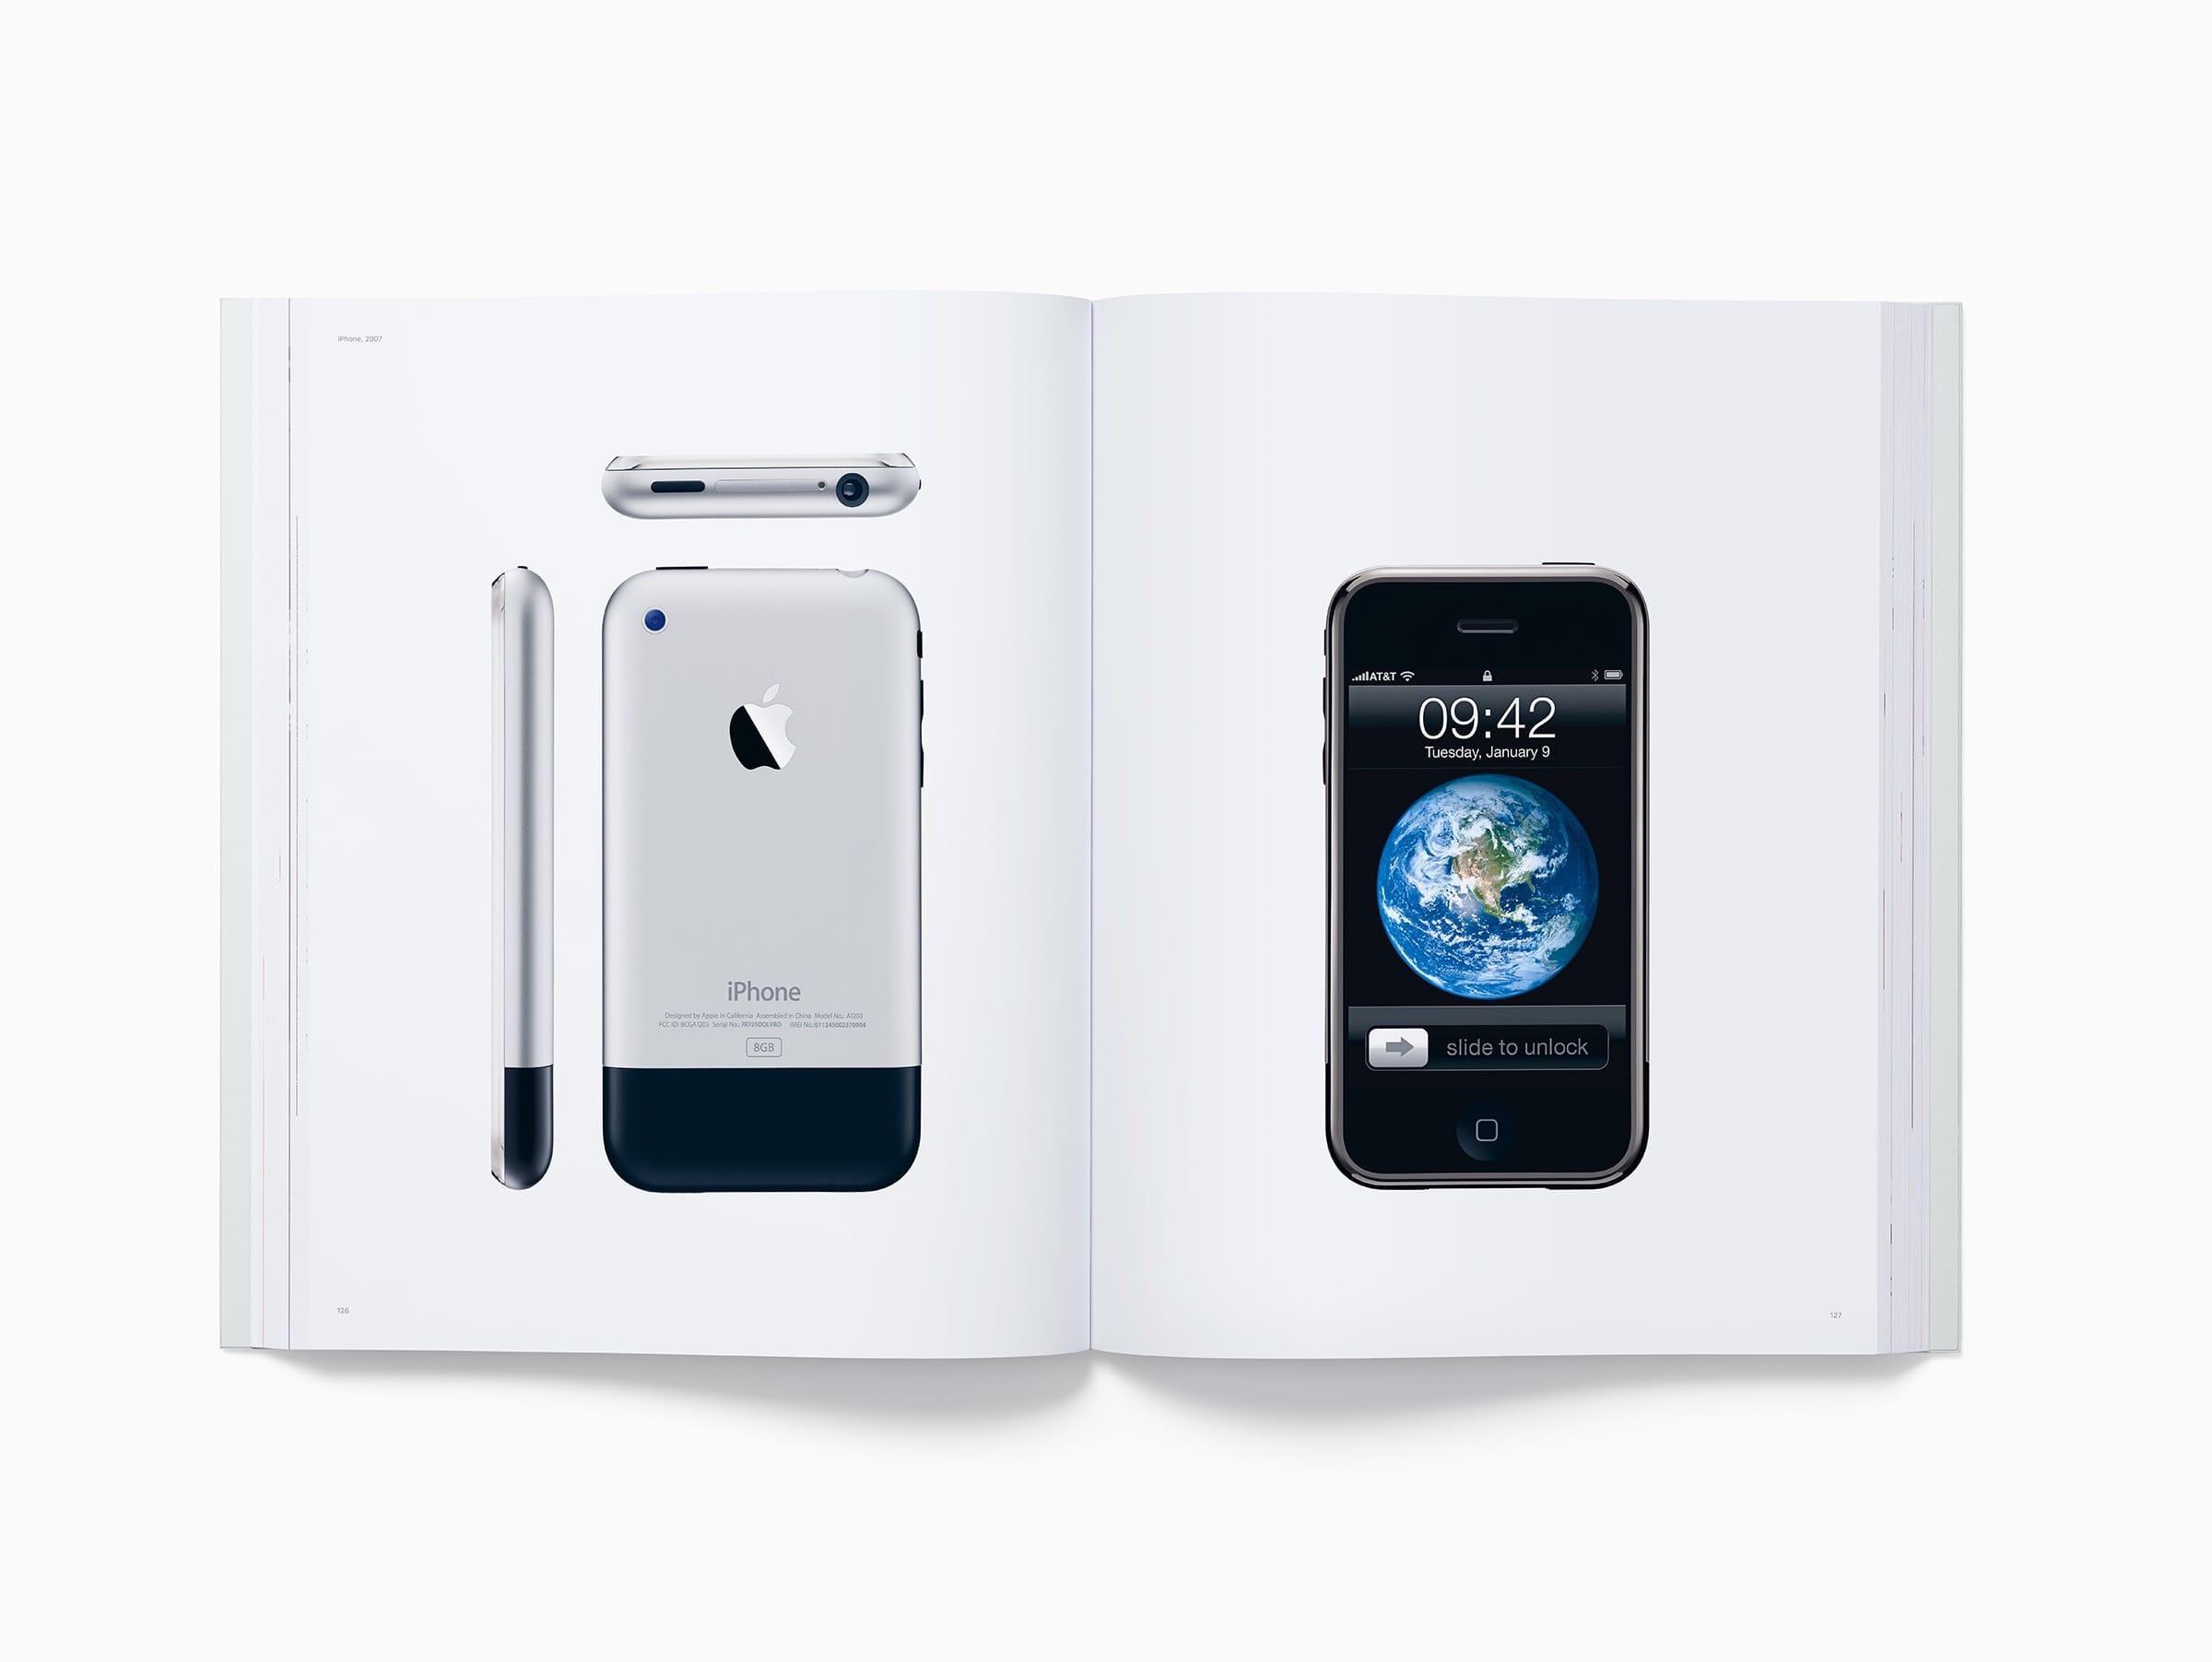 designed-by-apple-in-california-3-hero